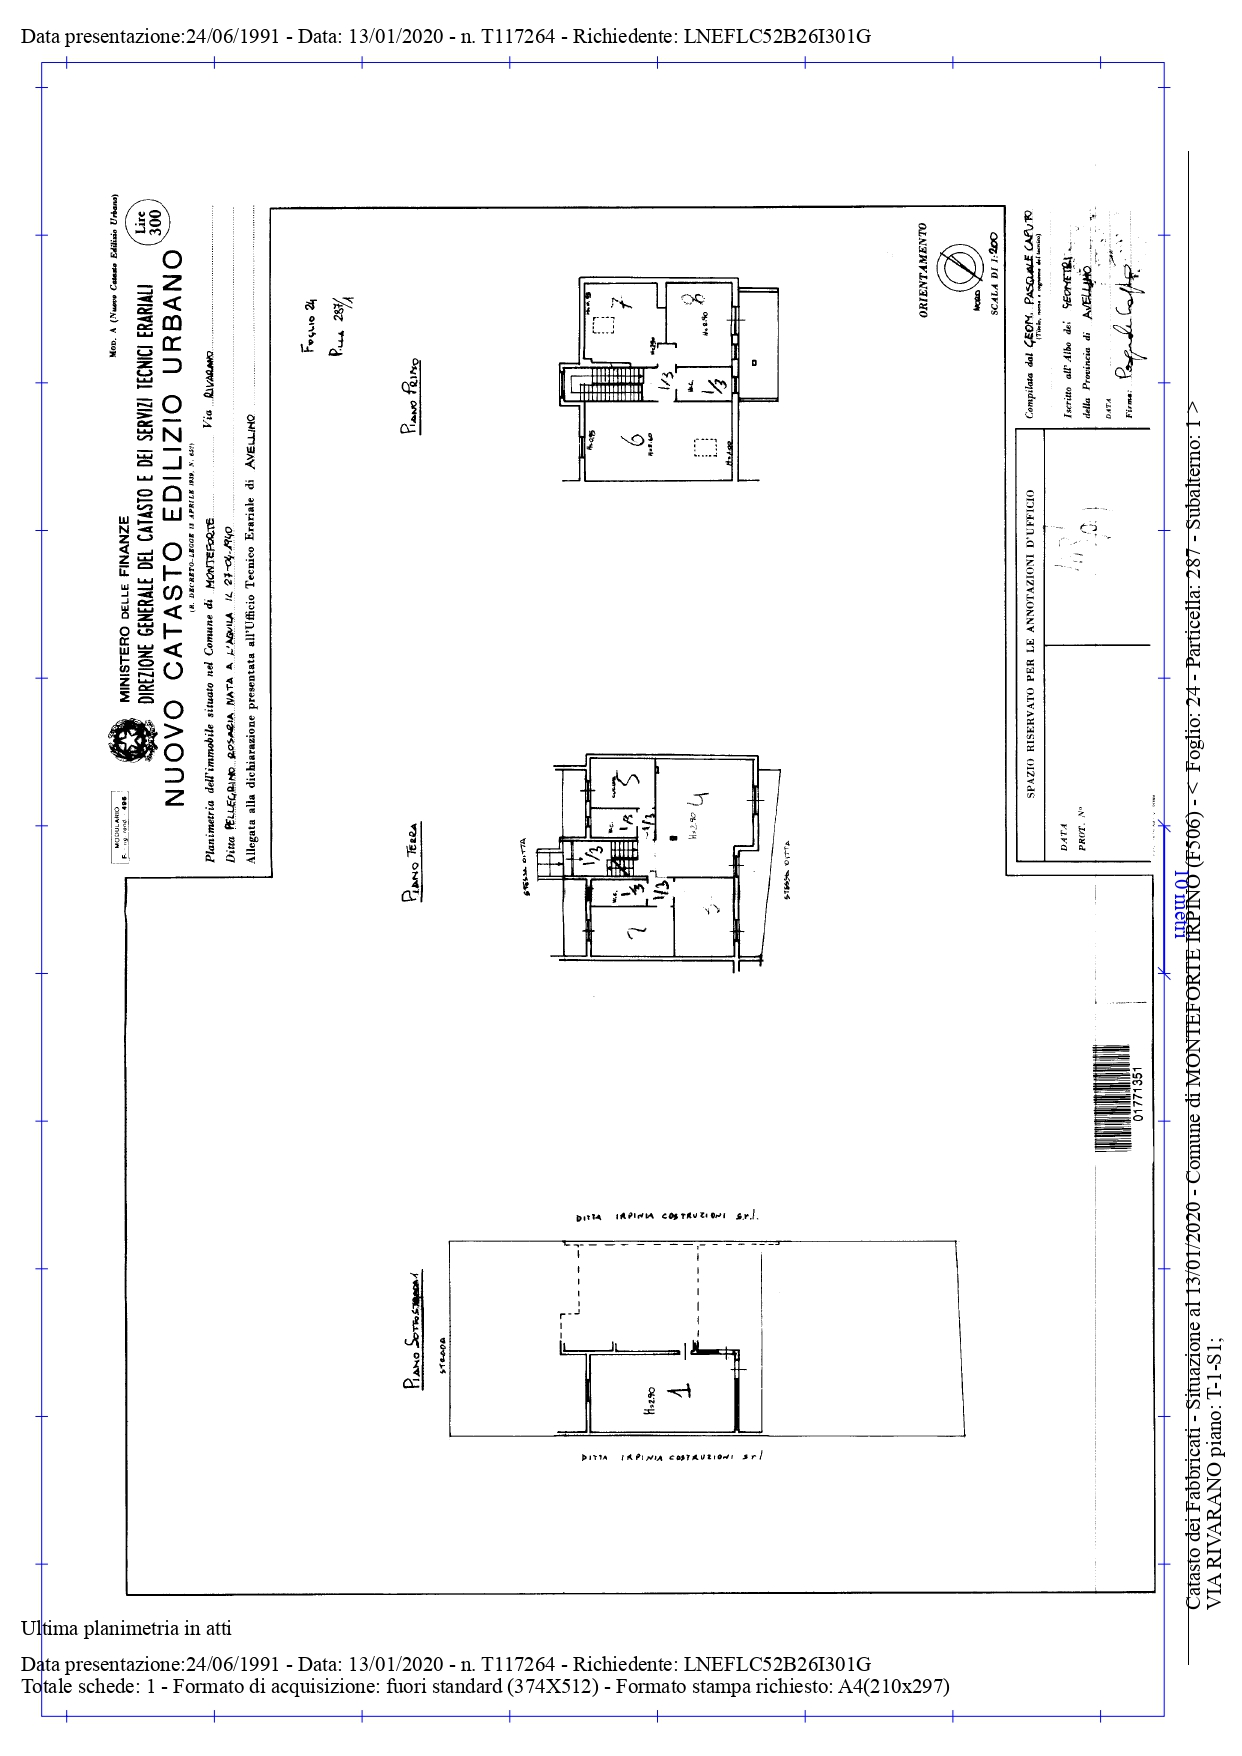 plan monteforte fg 24 p 287 sub 1 (abitazione)_page-0001.jpg